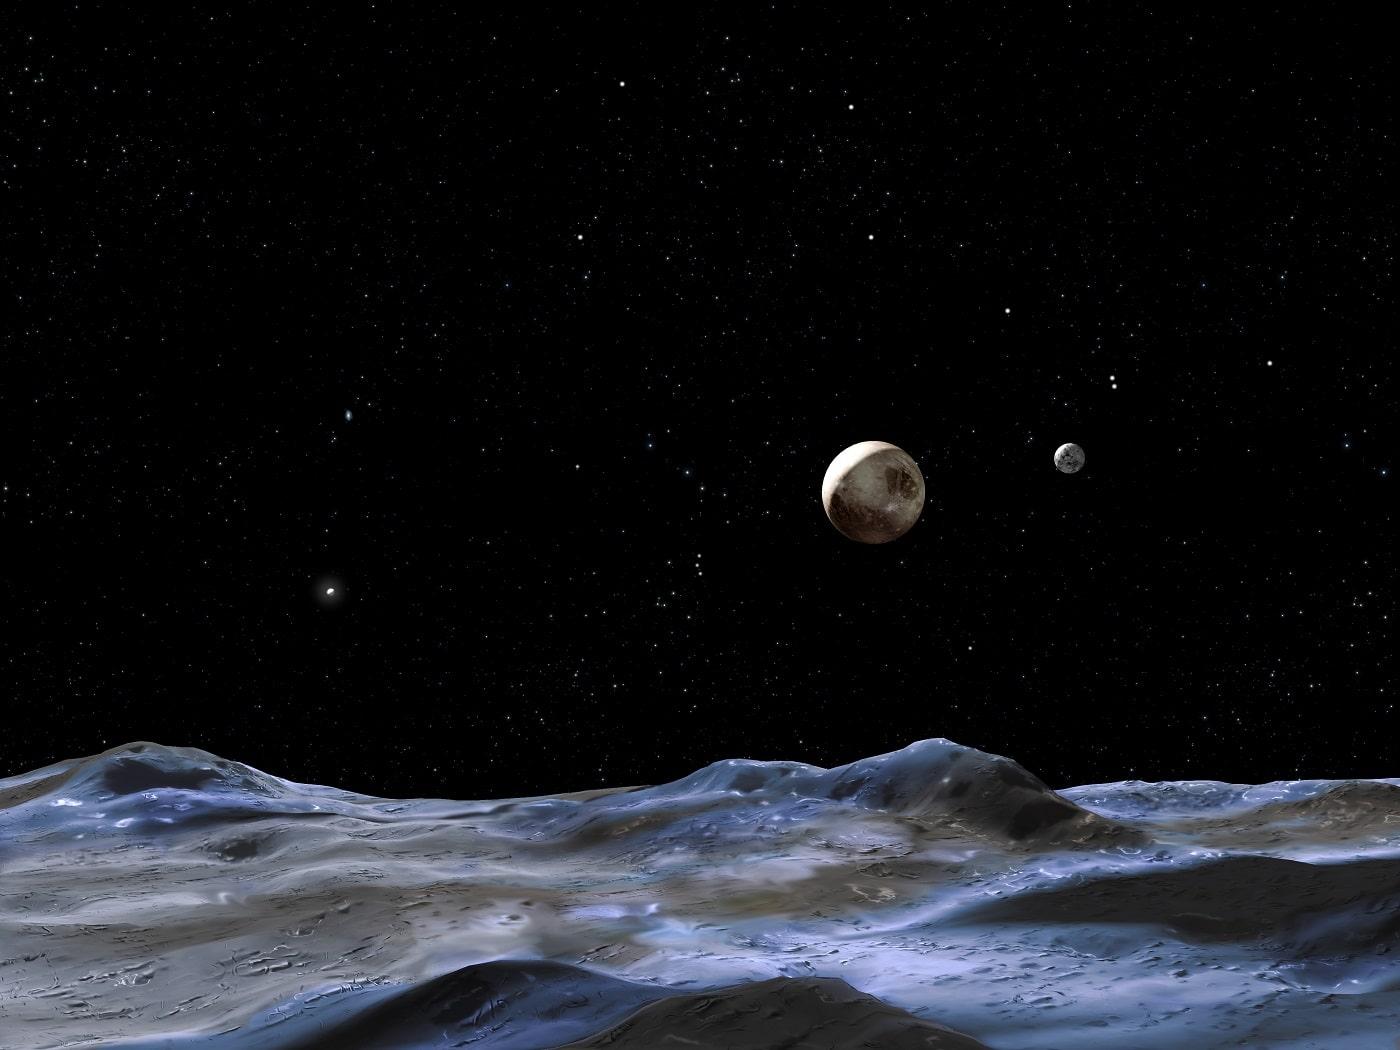 Las diferencias entre planeta enano y planeta